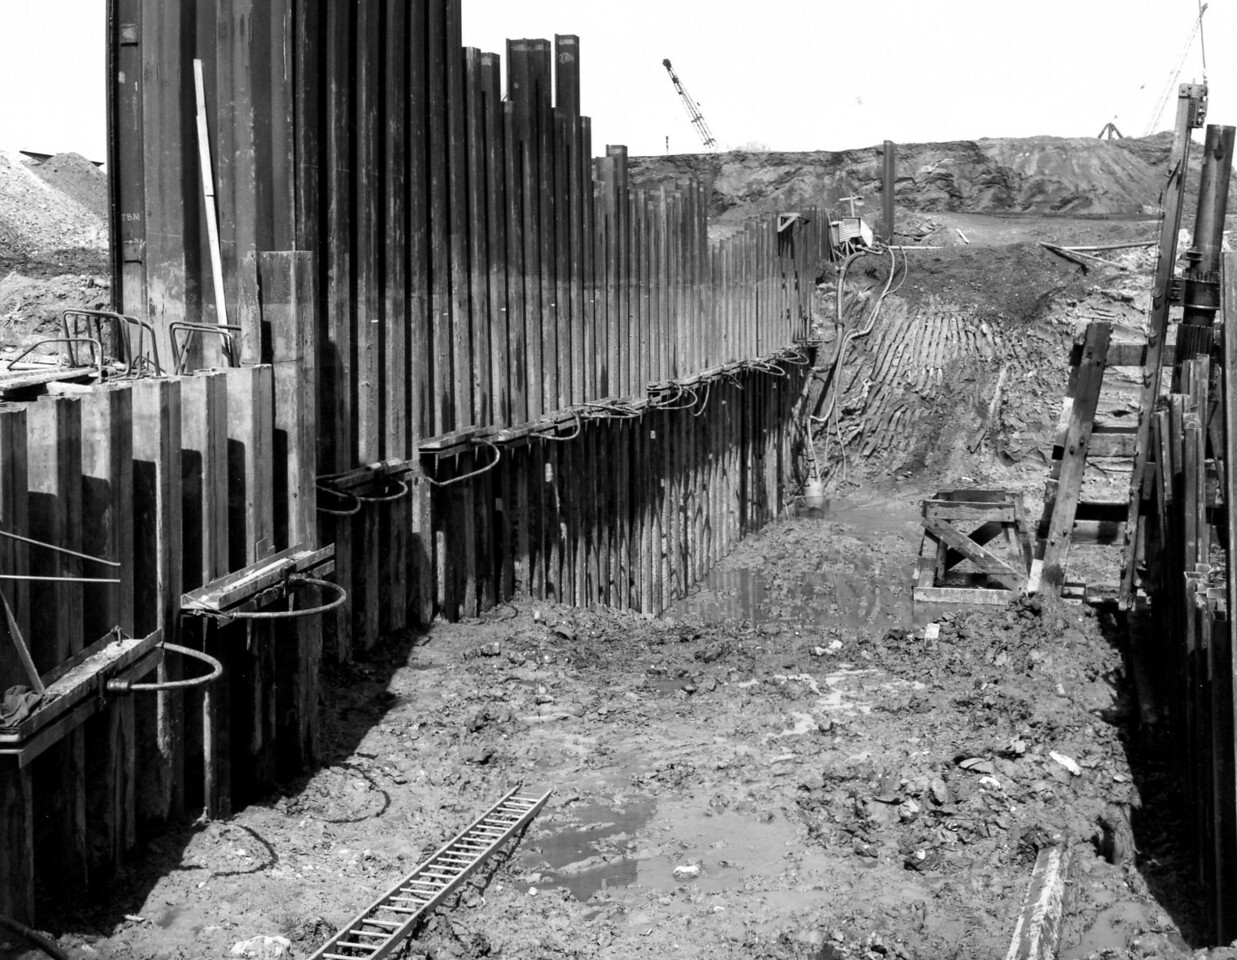 D025Excavation & piling in progress on west side 23/5/62